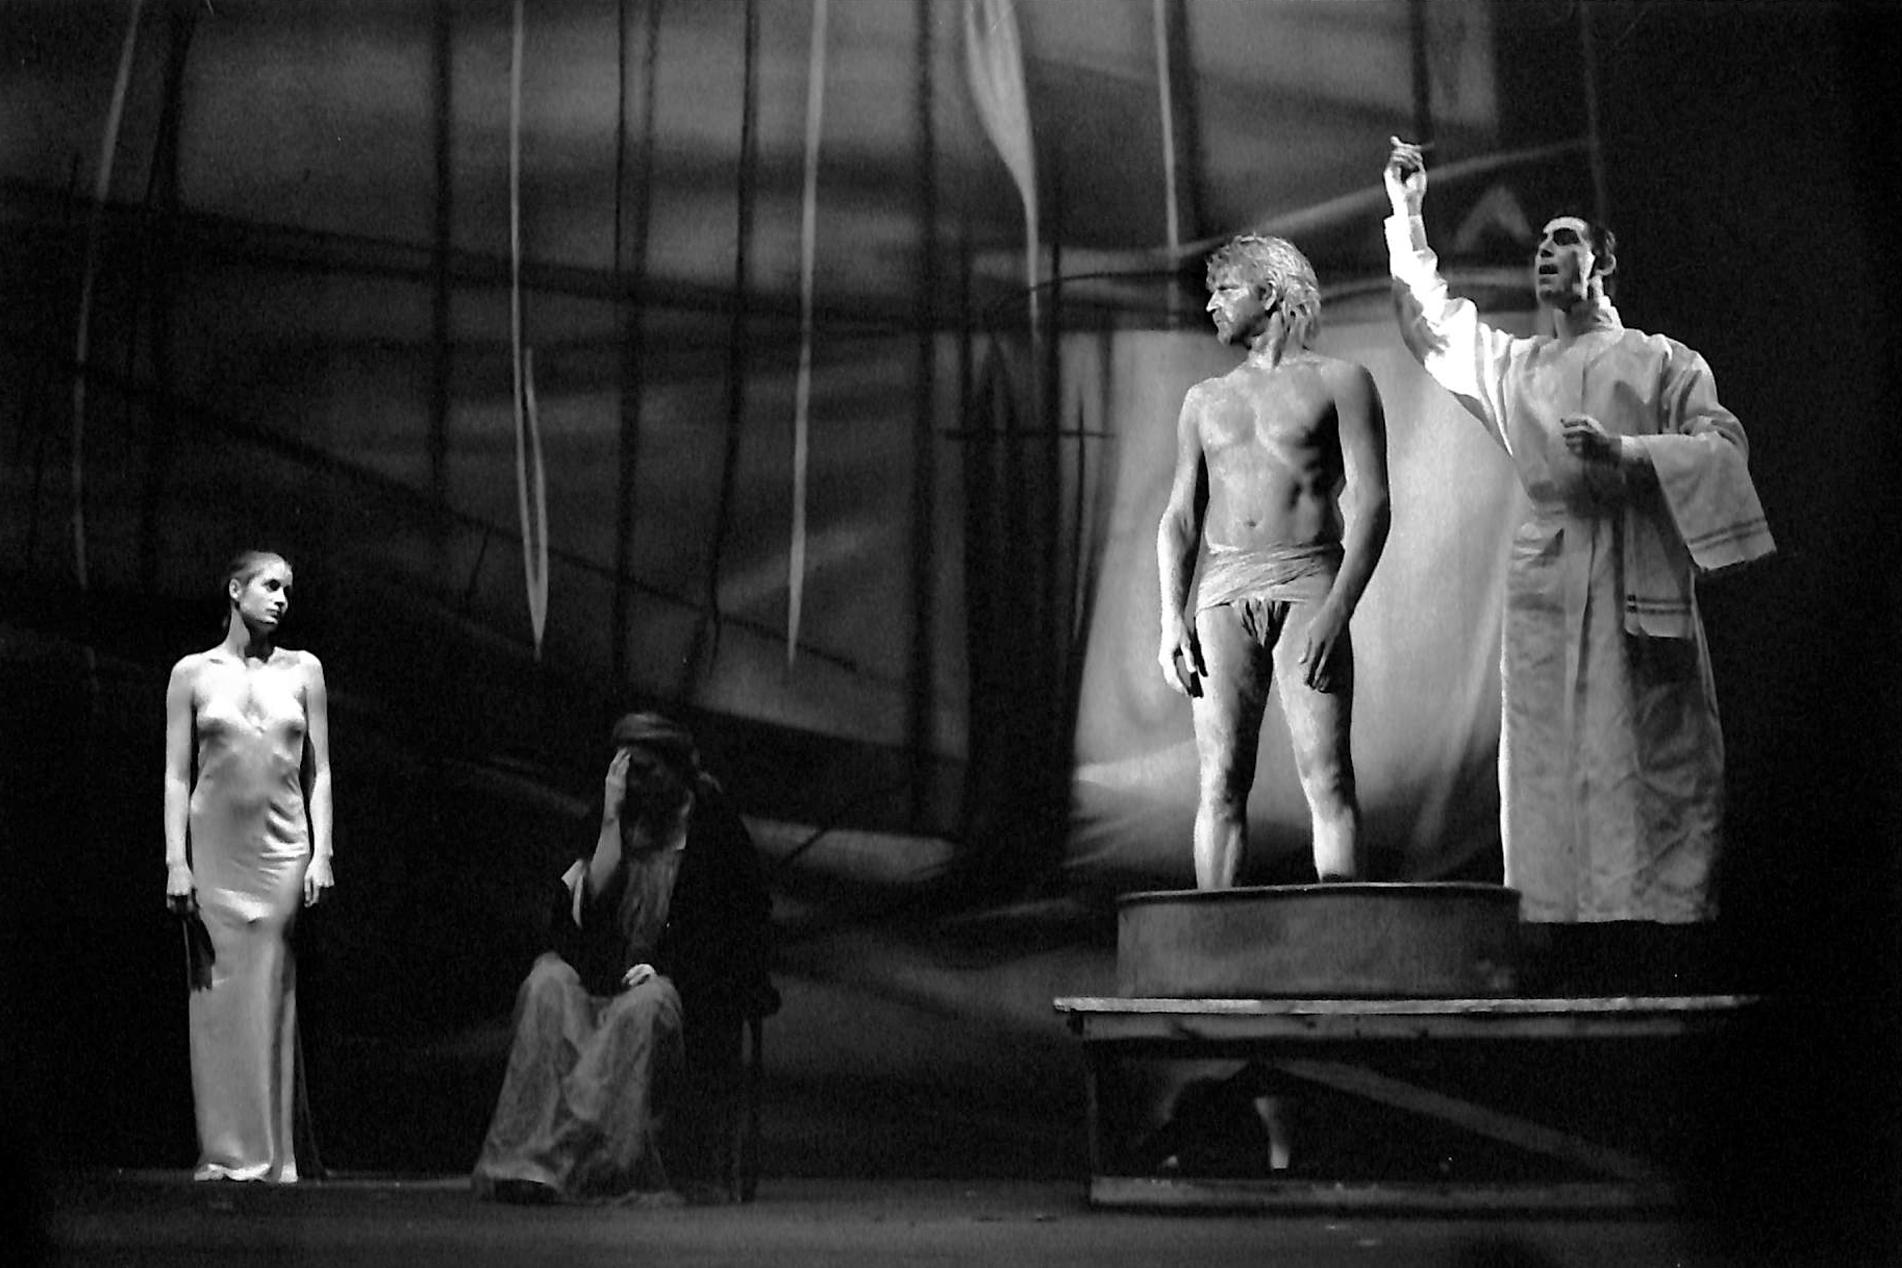 Act IV, Scene 4 - Geno Lechner (Whore),  Ensemble, Howie Seago (Enkidu), Simon Newby-Koschwitz (Barber)